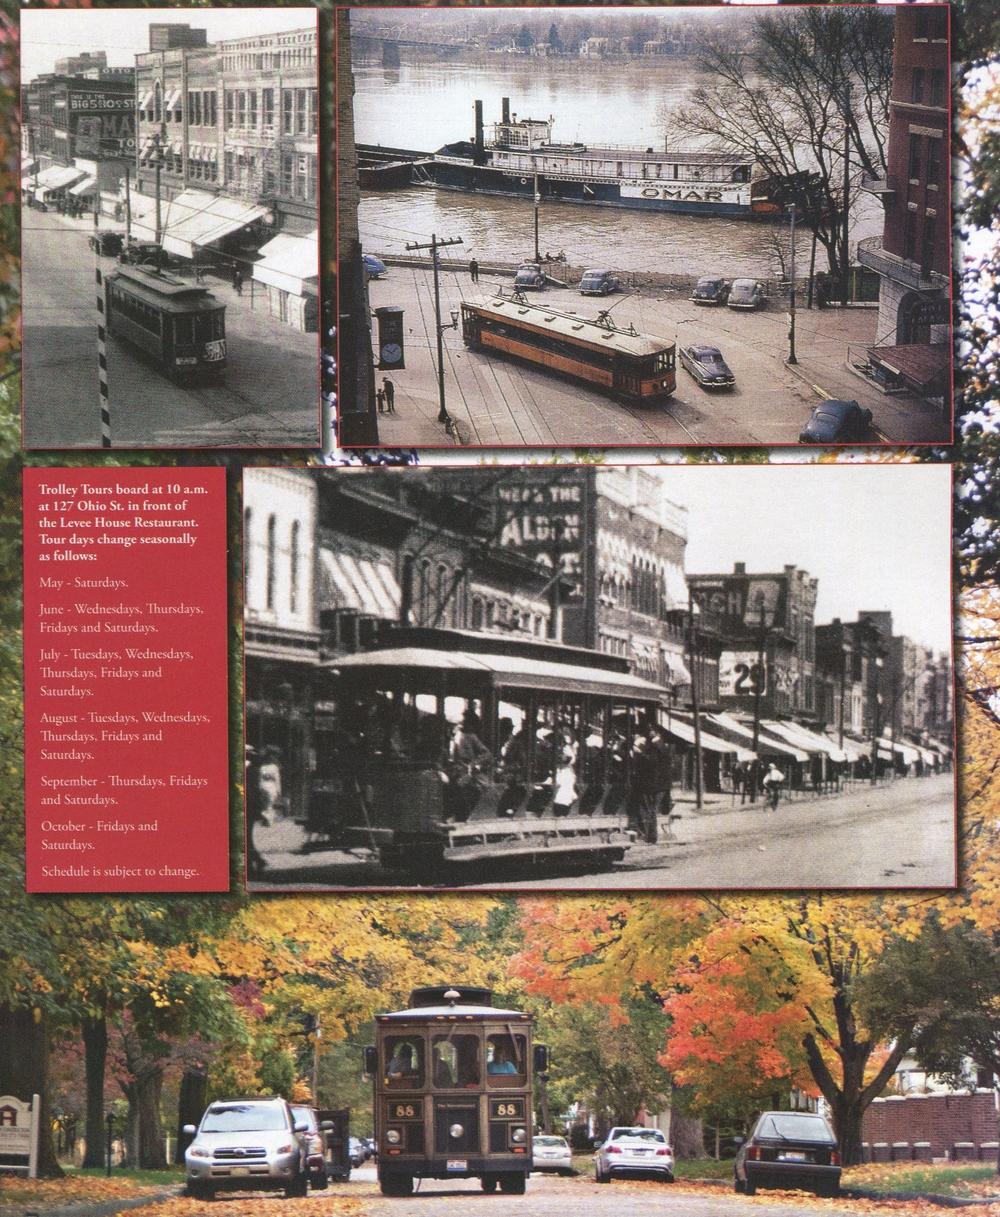 Marietta-Ohio-Visitors-Guide-2015.jpg